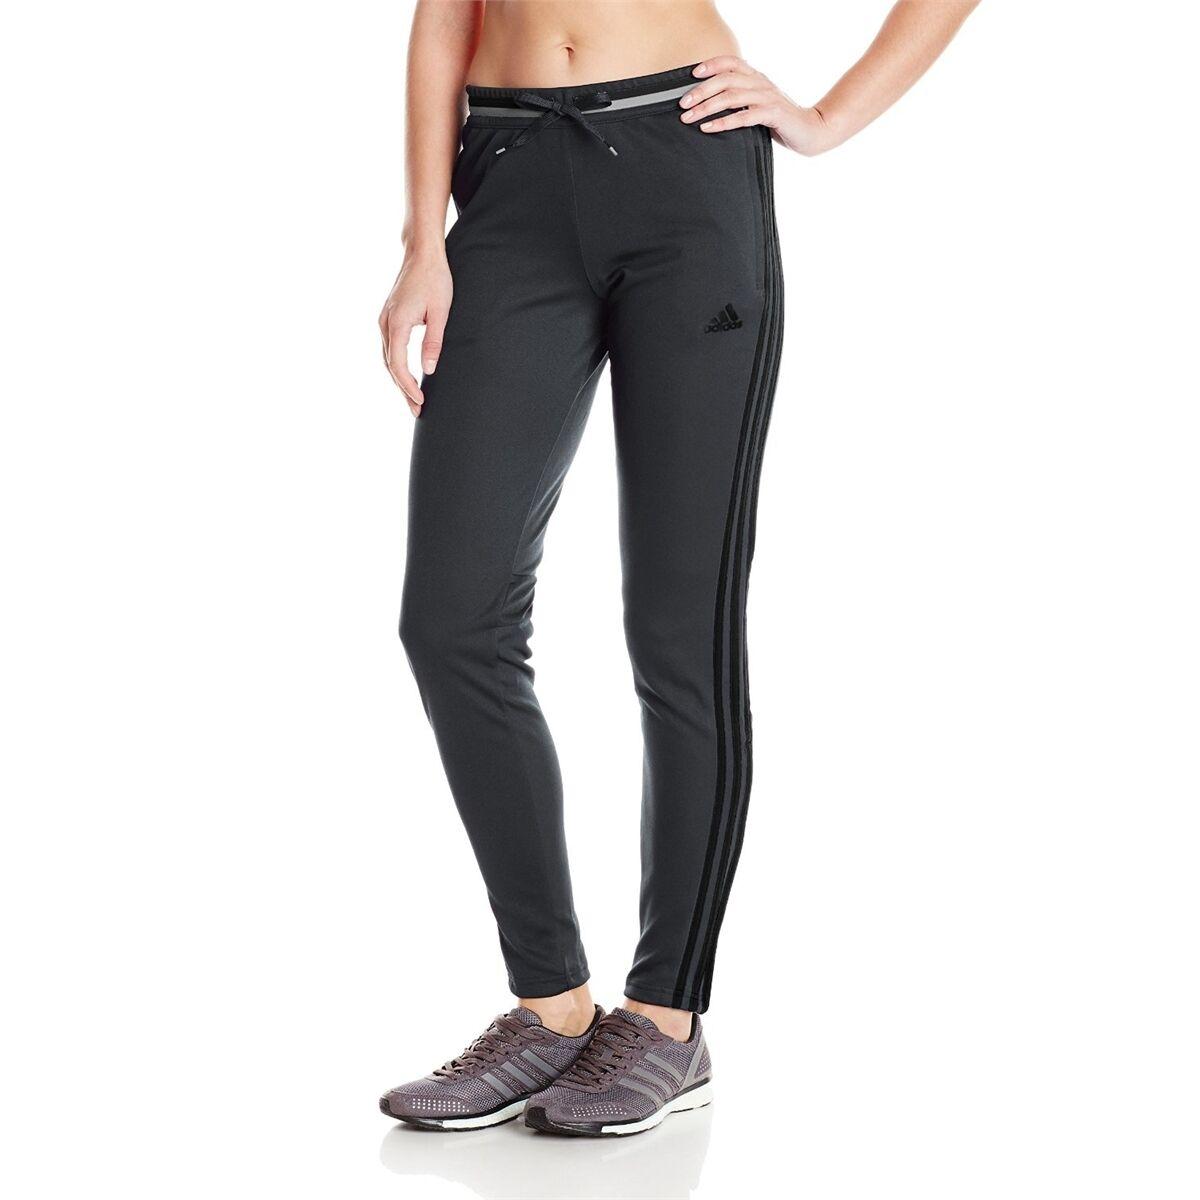 Womens Adidas Condivo 16 Training Pants Grey Black Athletic